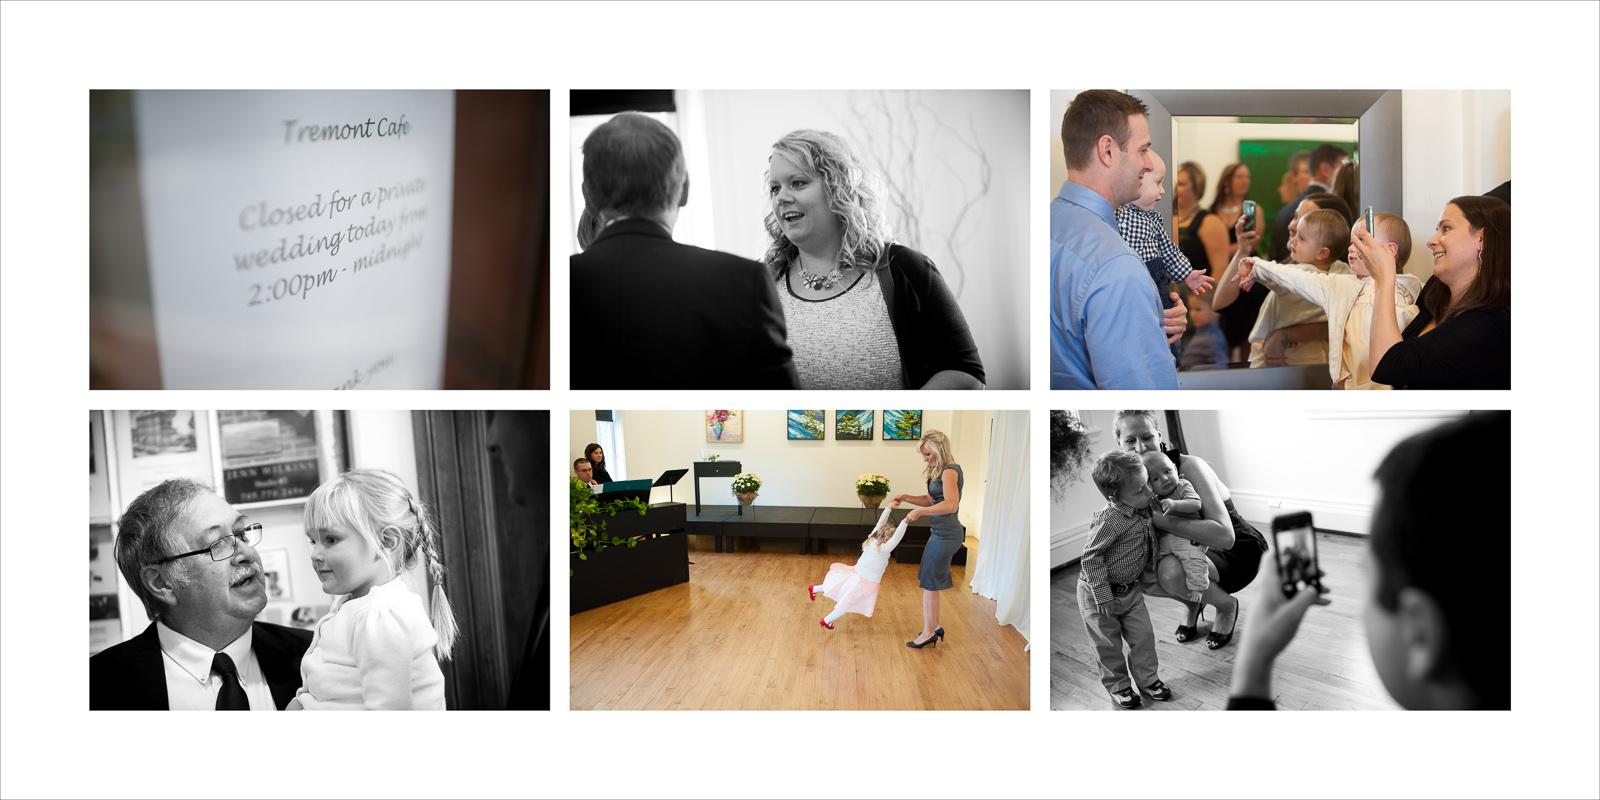 collingwood-wedding-photo-album-009.jpg